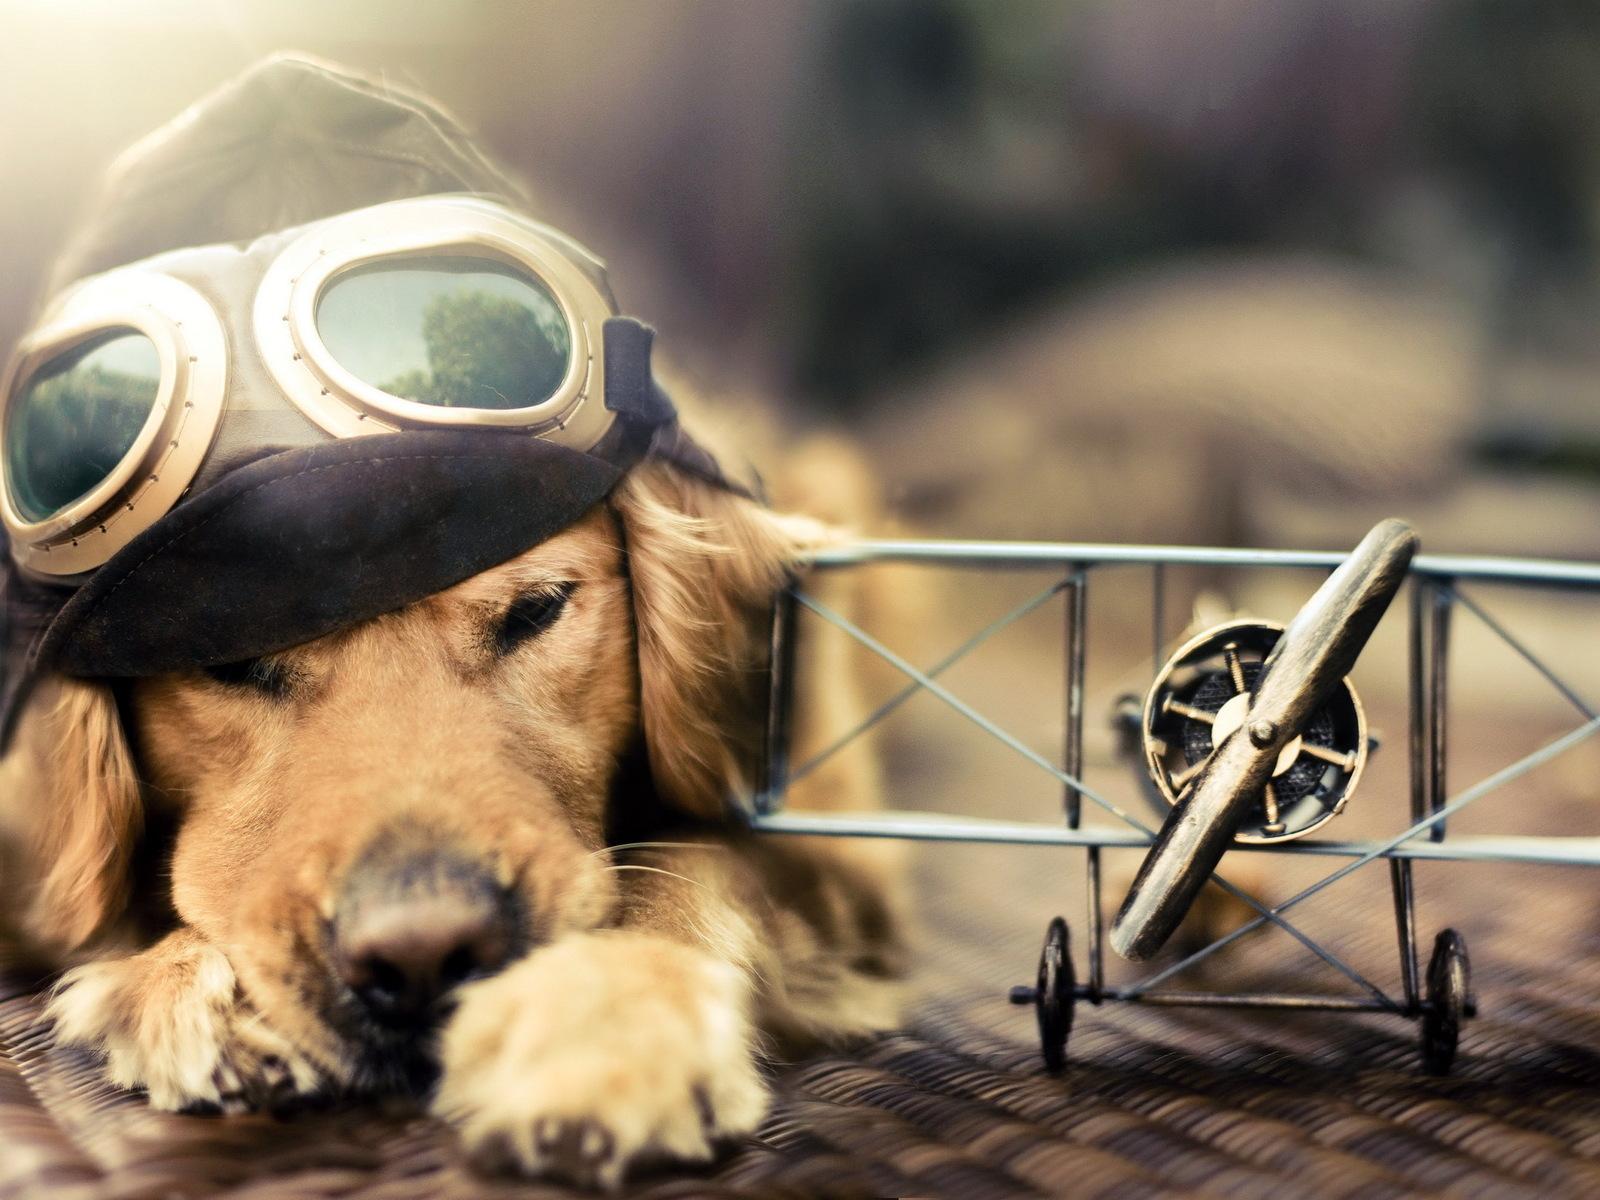 funny dog hd wallpaper - photo #27